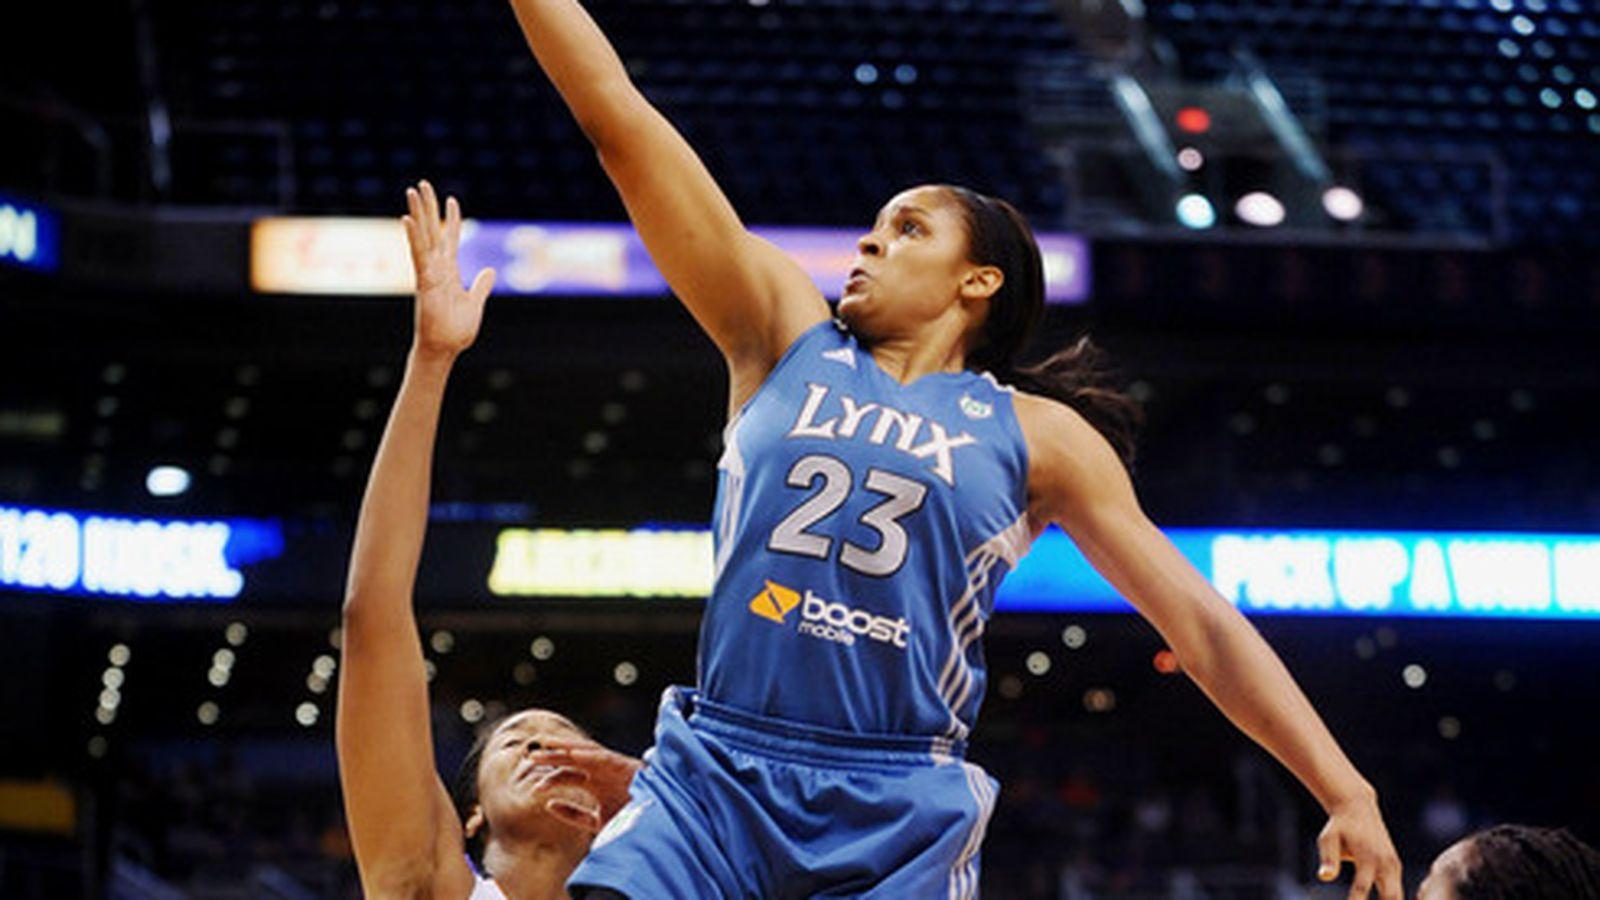 2012 Minnesota Lynx season - Wikipedia